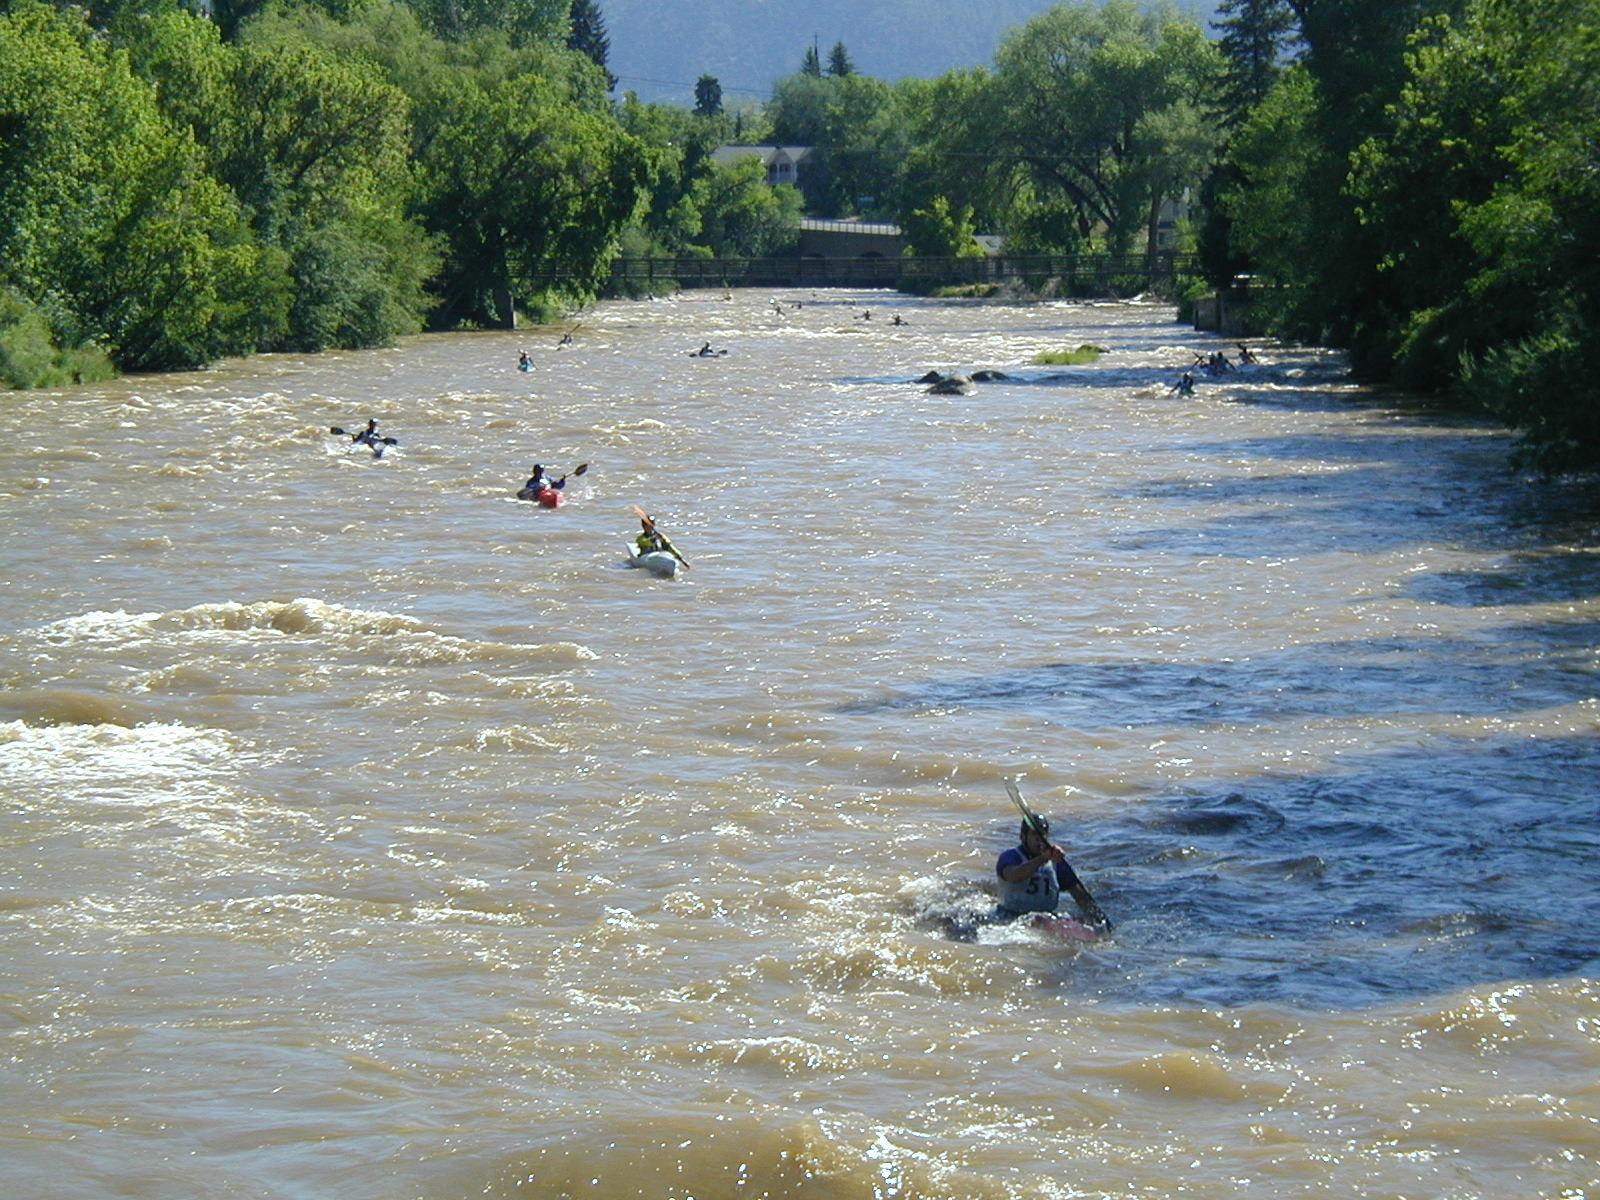 Kayakers Race on Animas River Festival